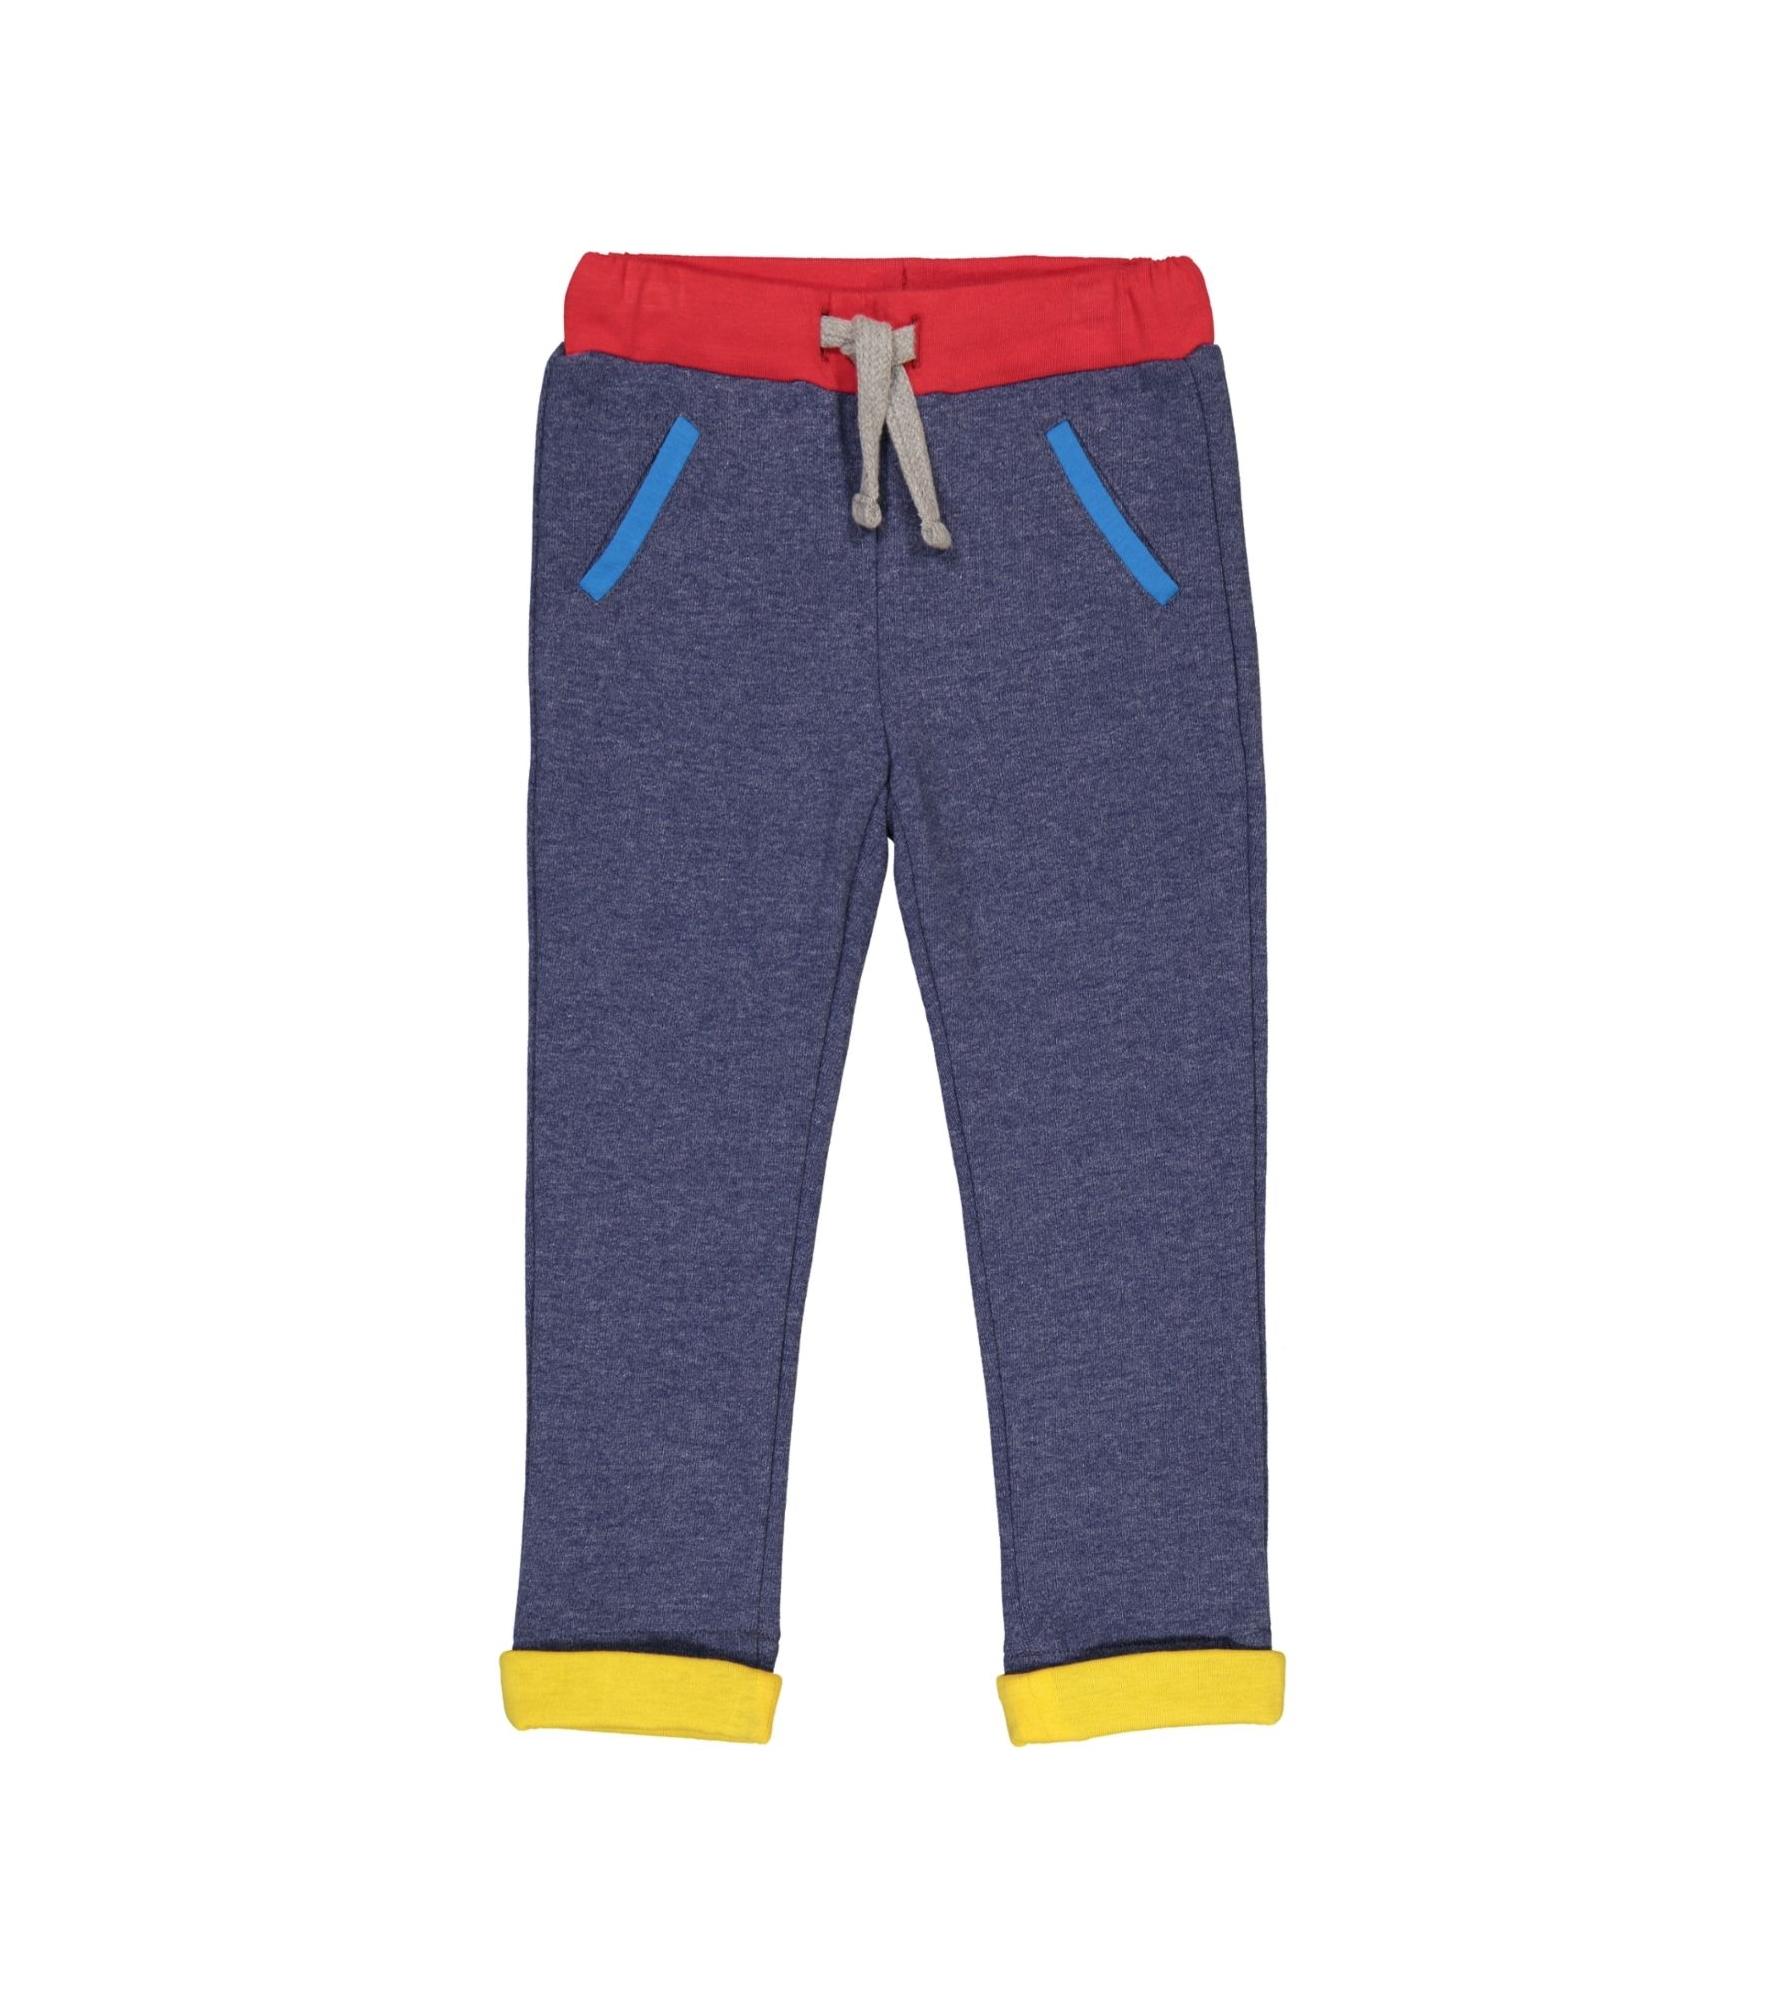 Malmo Slim Fit Sweatpants Heather Blue_downsized.jpg